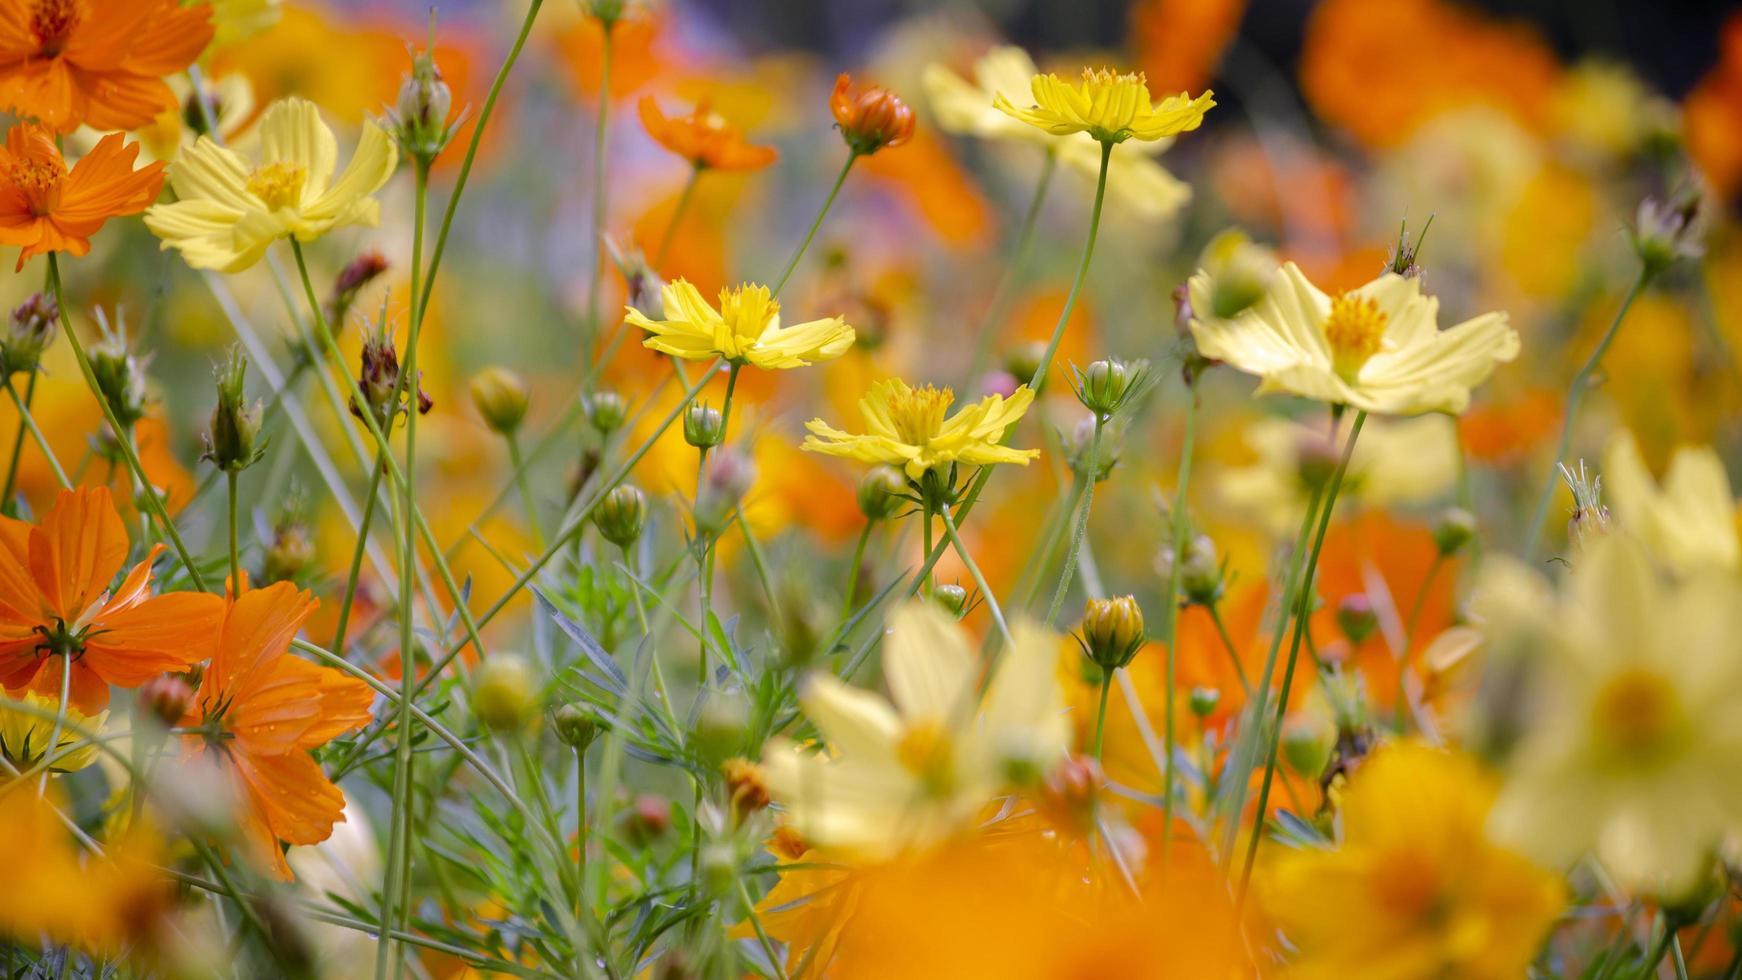 Cosmos flowers blooming in  garden photo